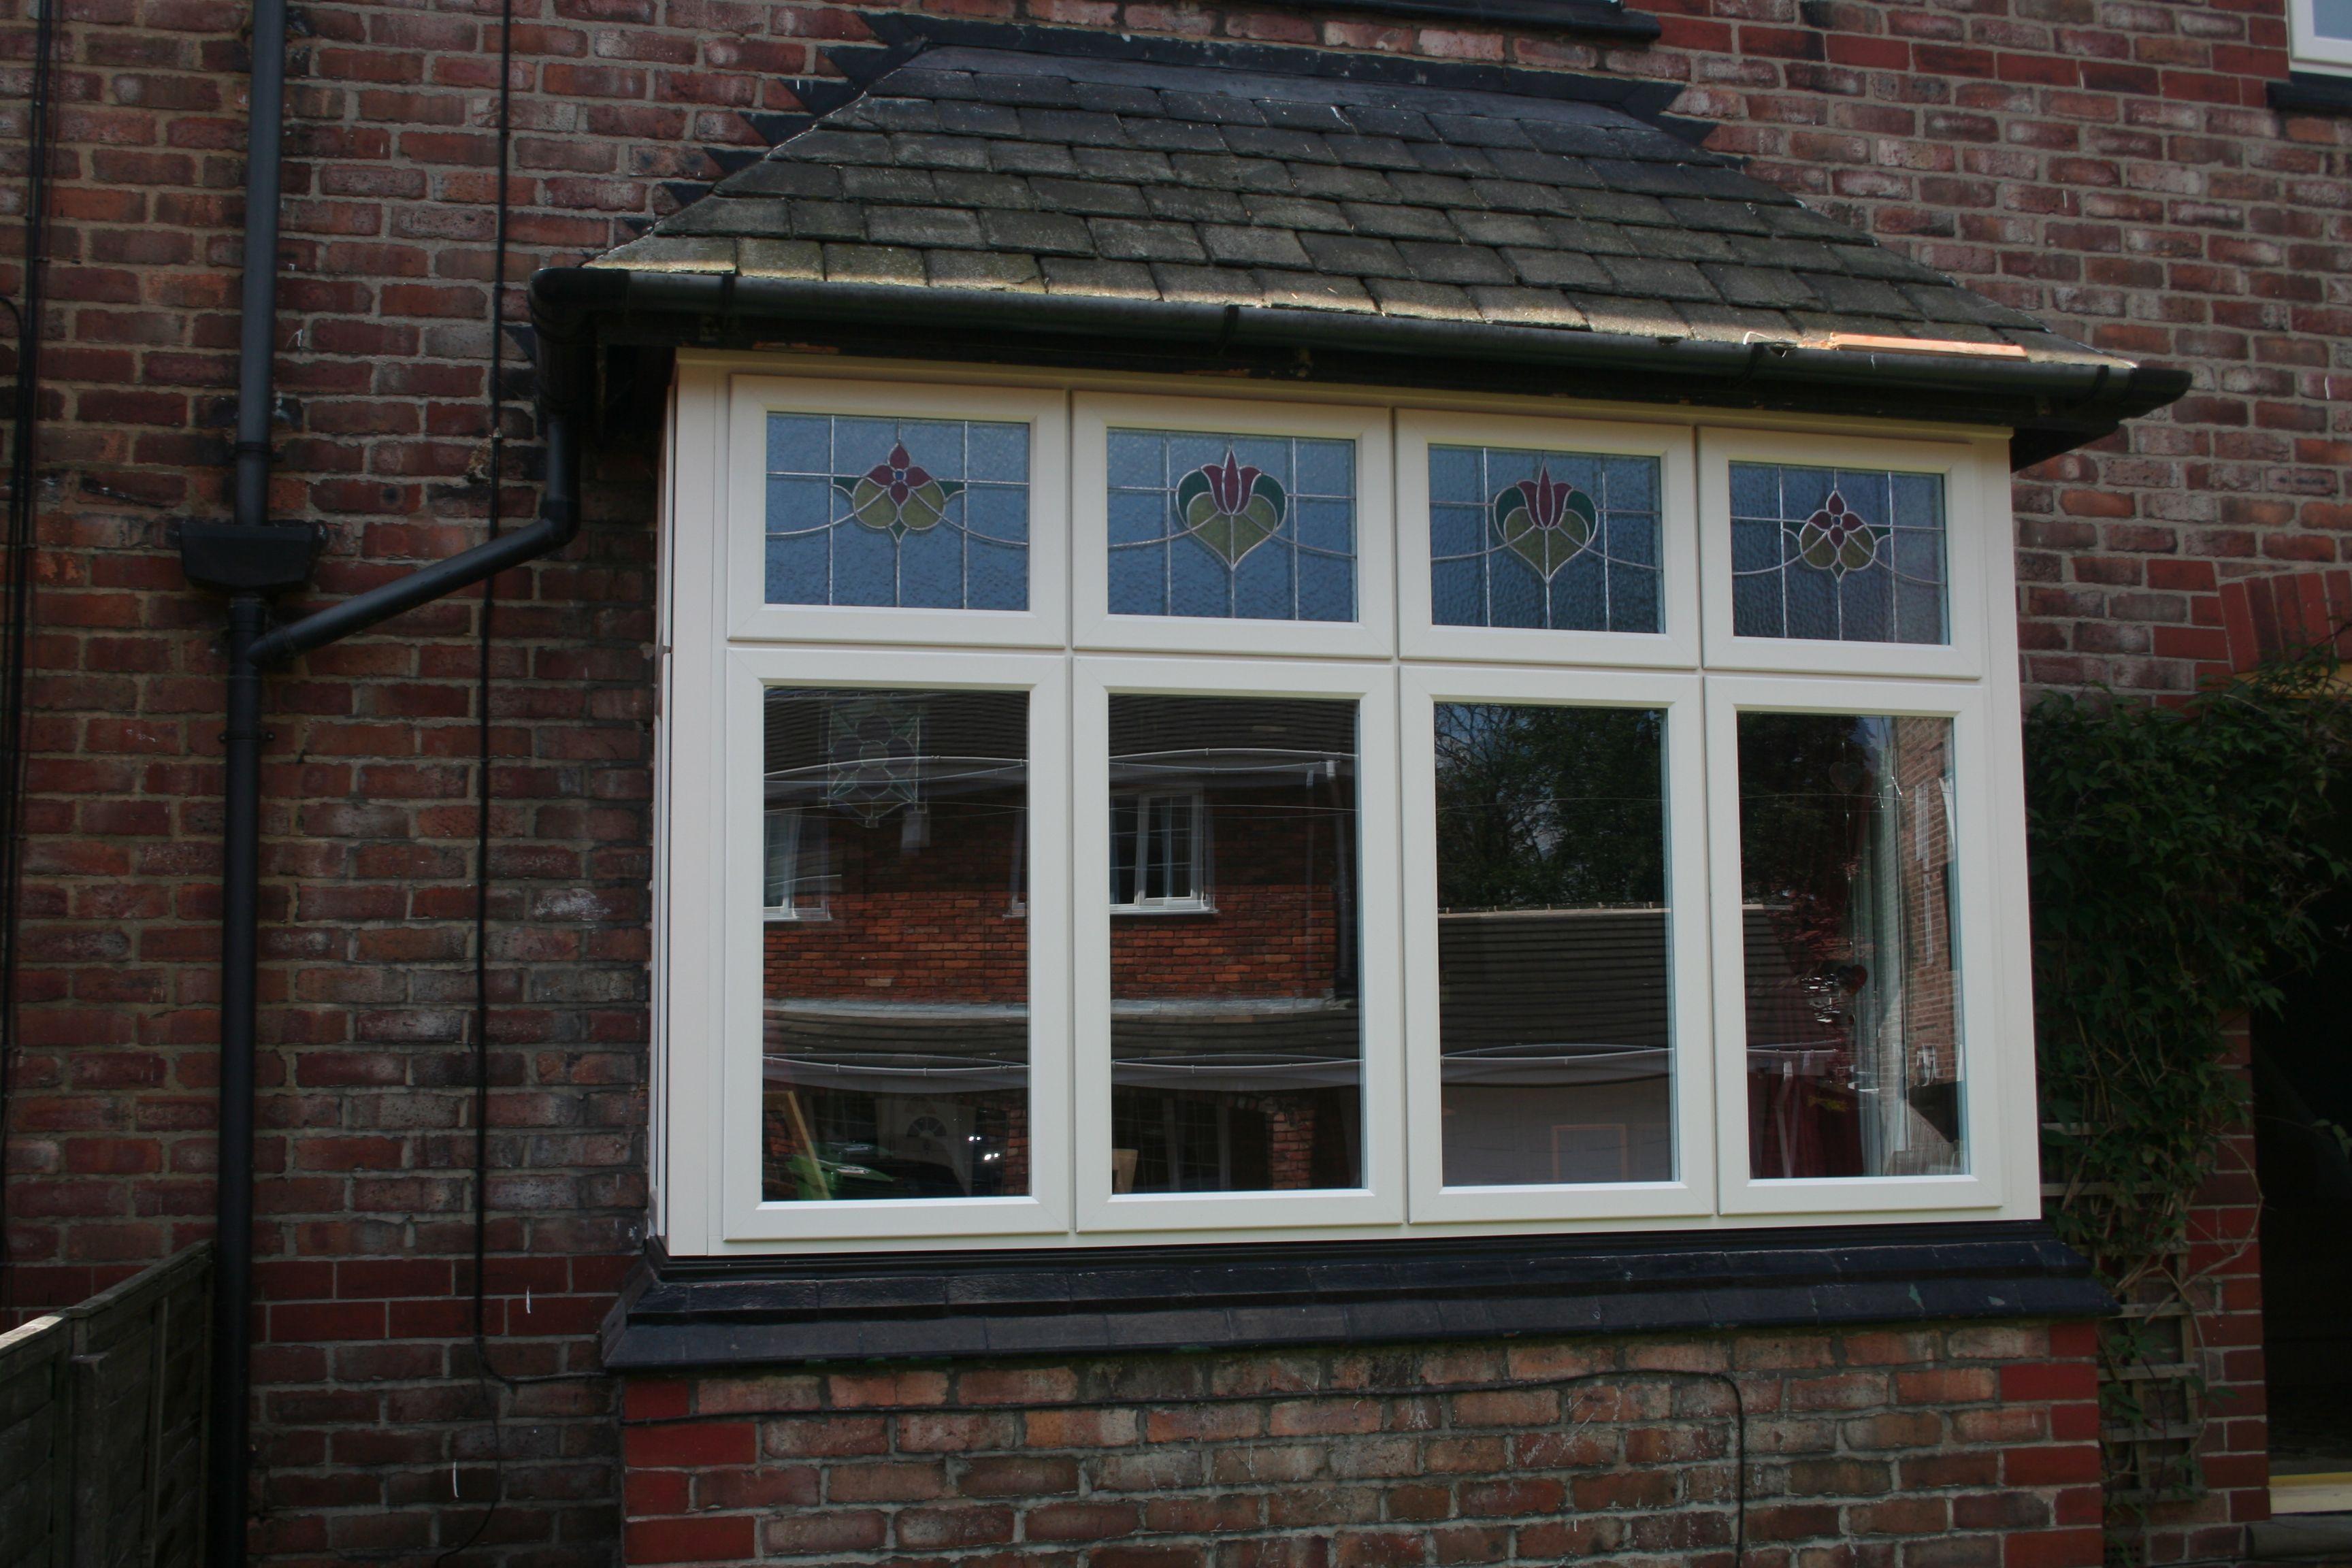 Stom 2 Upvc Cottage Style Windows With Custom Coloured Leads Windows Modern Windows Sash Windows